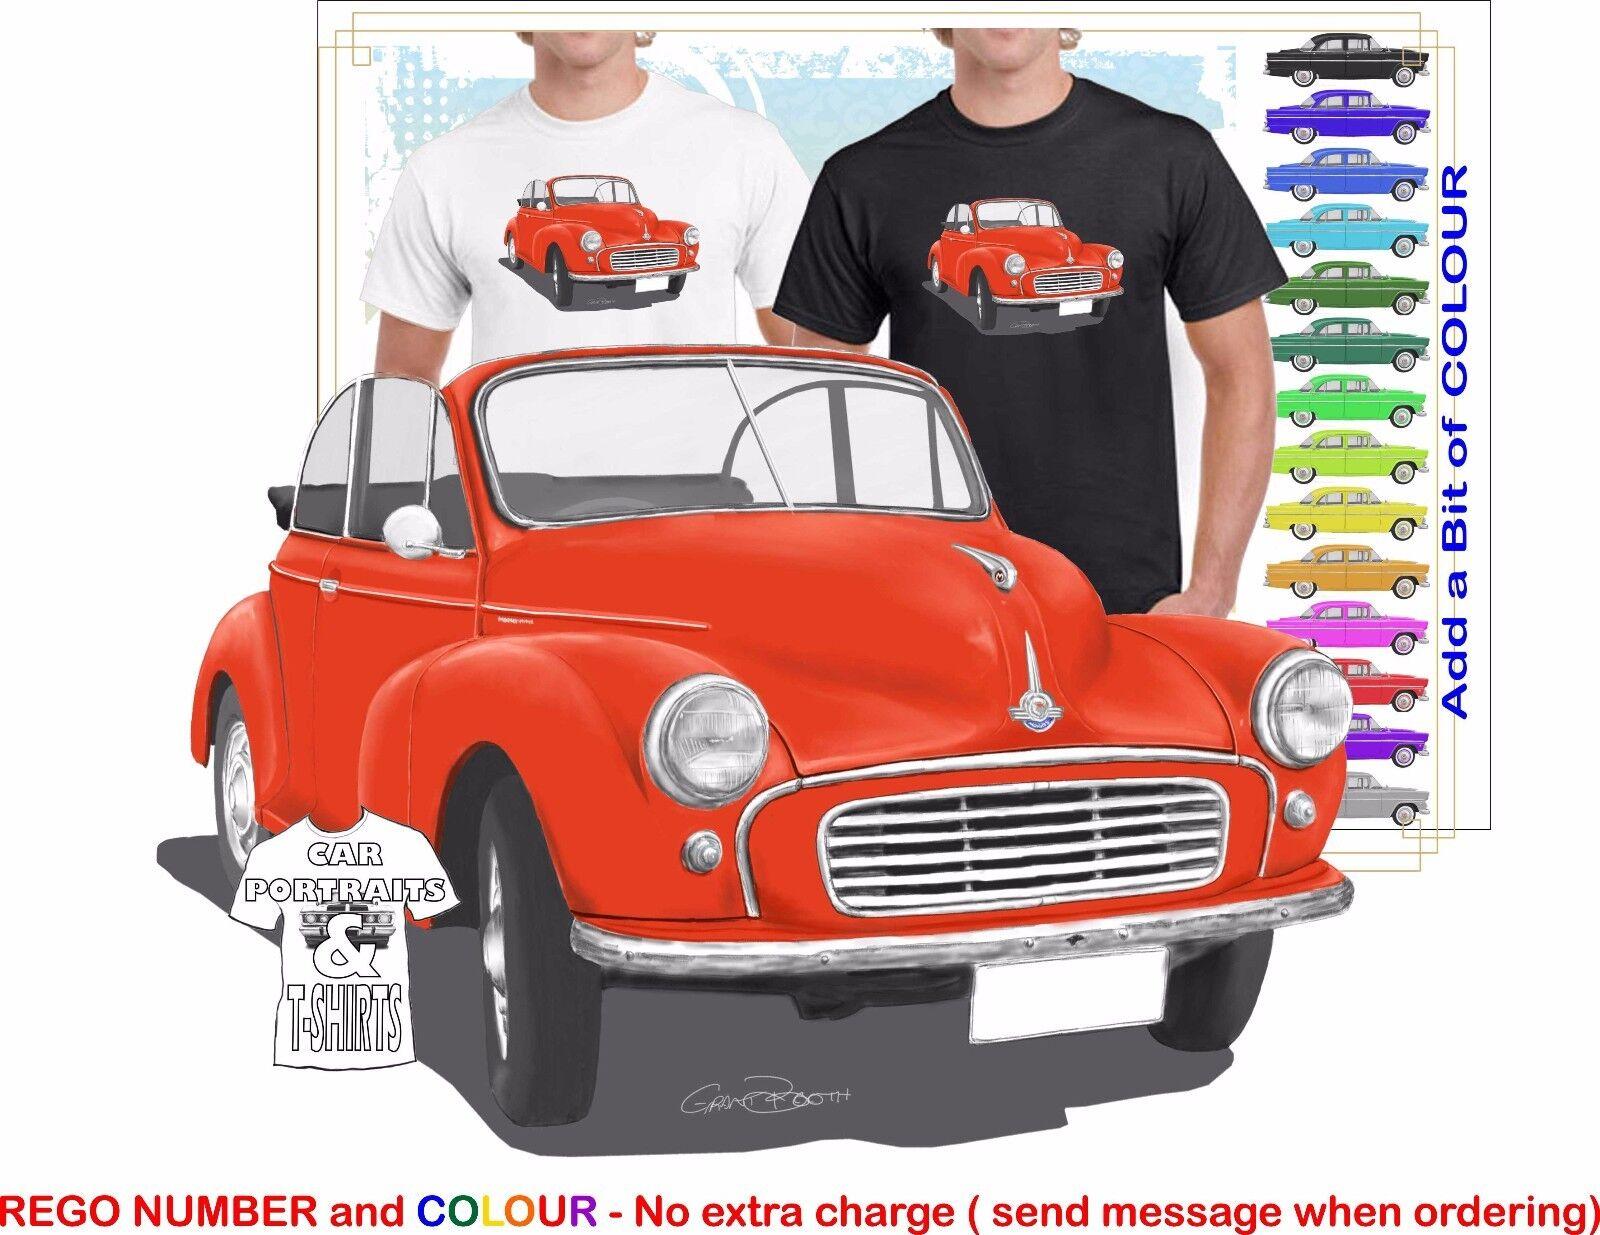 CLASSIC 52-56 MORRIS MINOR CONgreenIBLE ILLUSTRATED T-SHIRT MUSCLE RETRO CAR